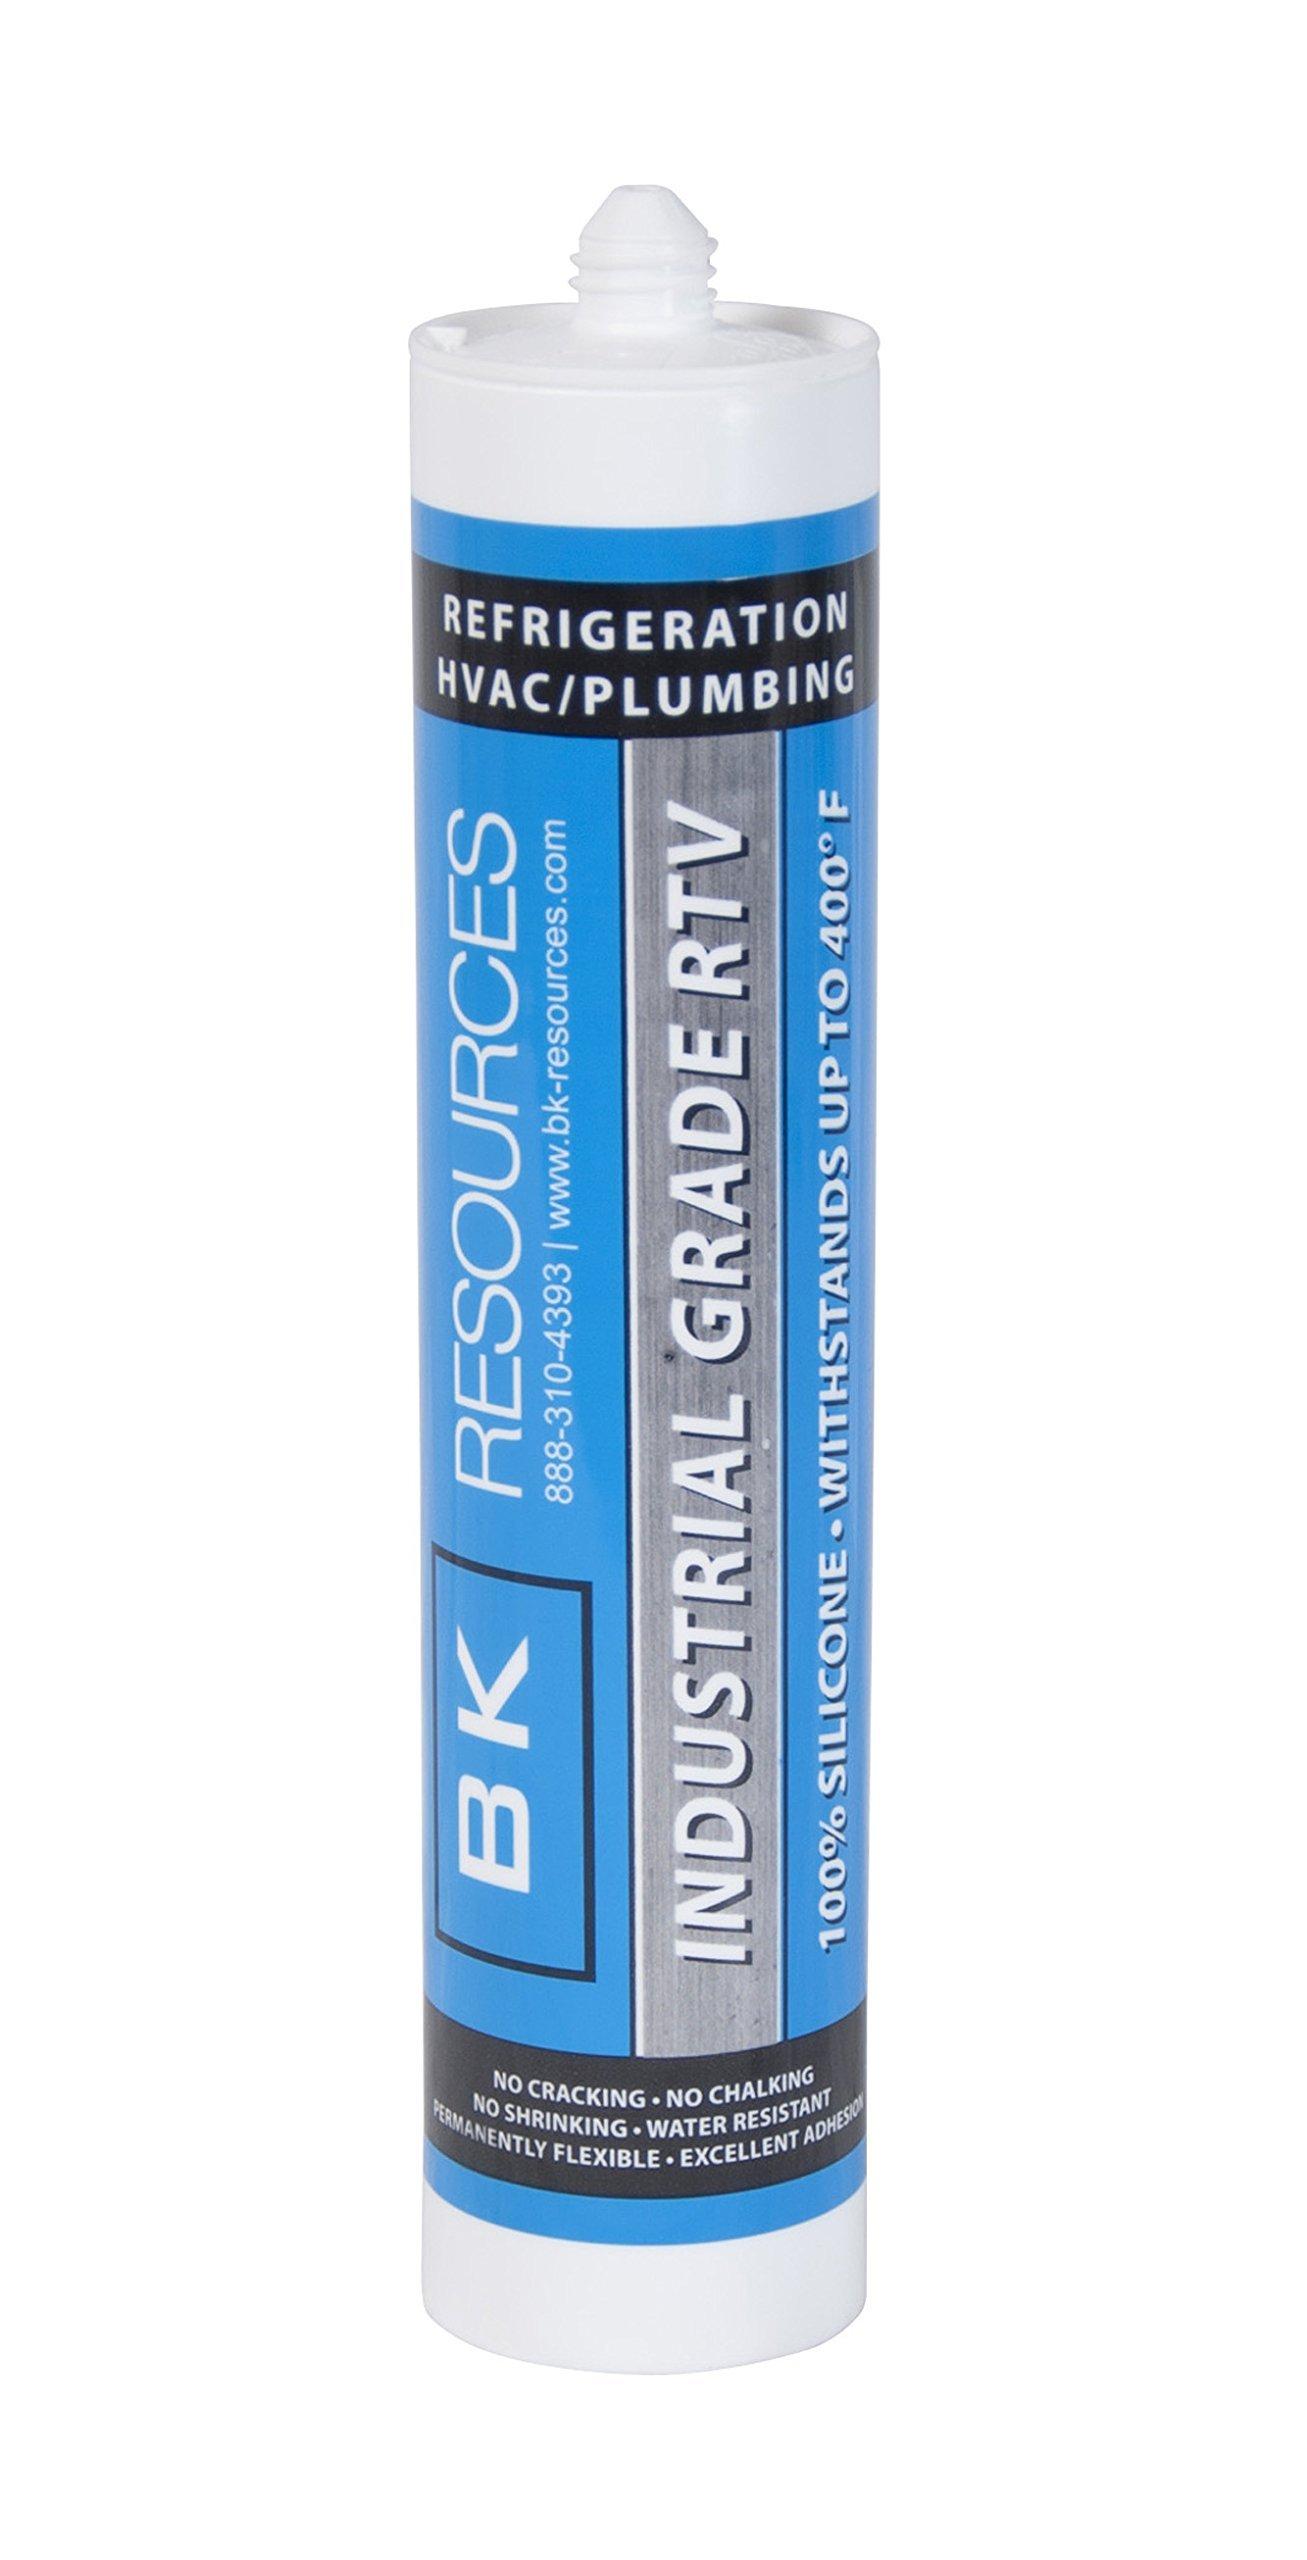 BK Resources BK-SC-CL Clear Silicone Caulking 10 Oz. Tube